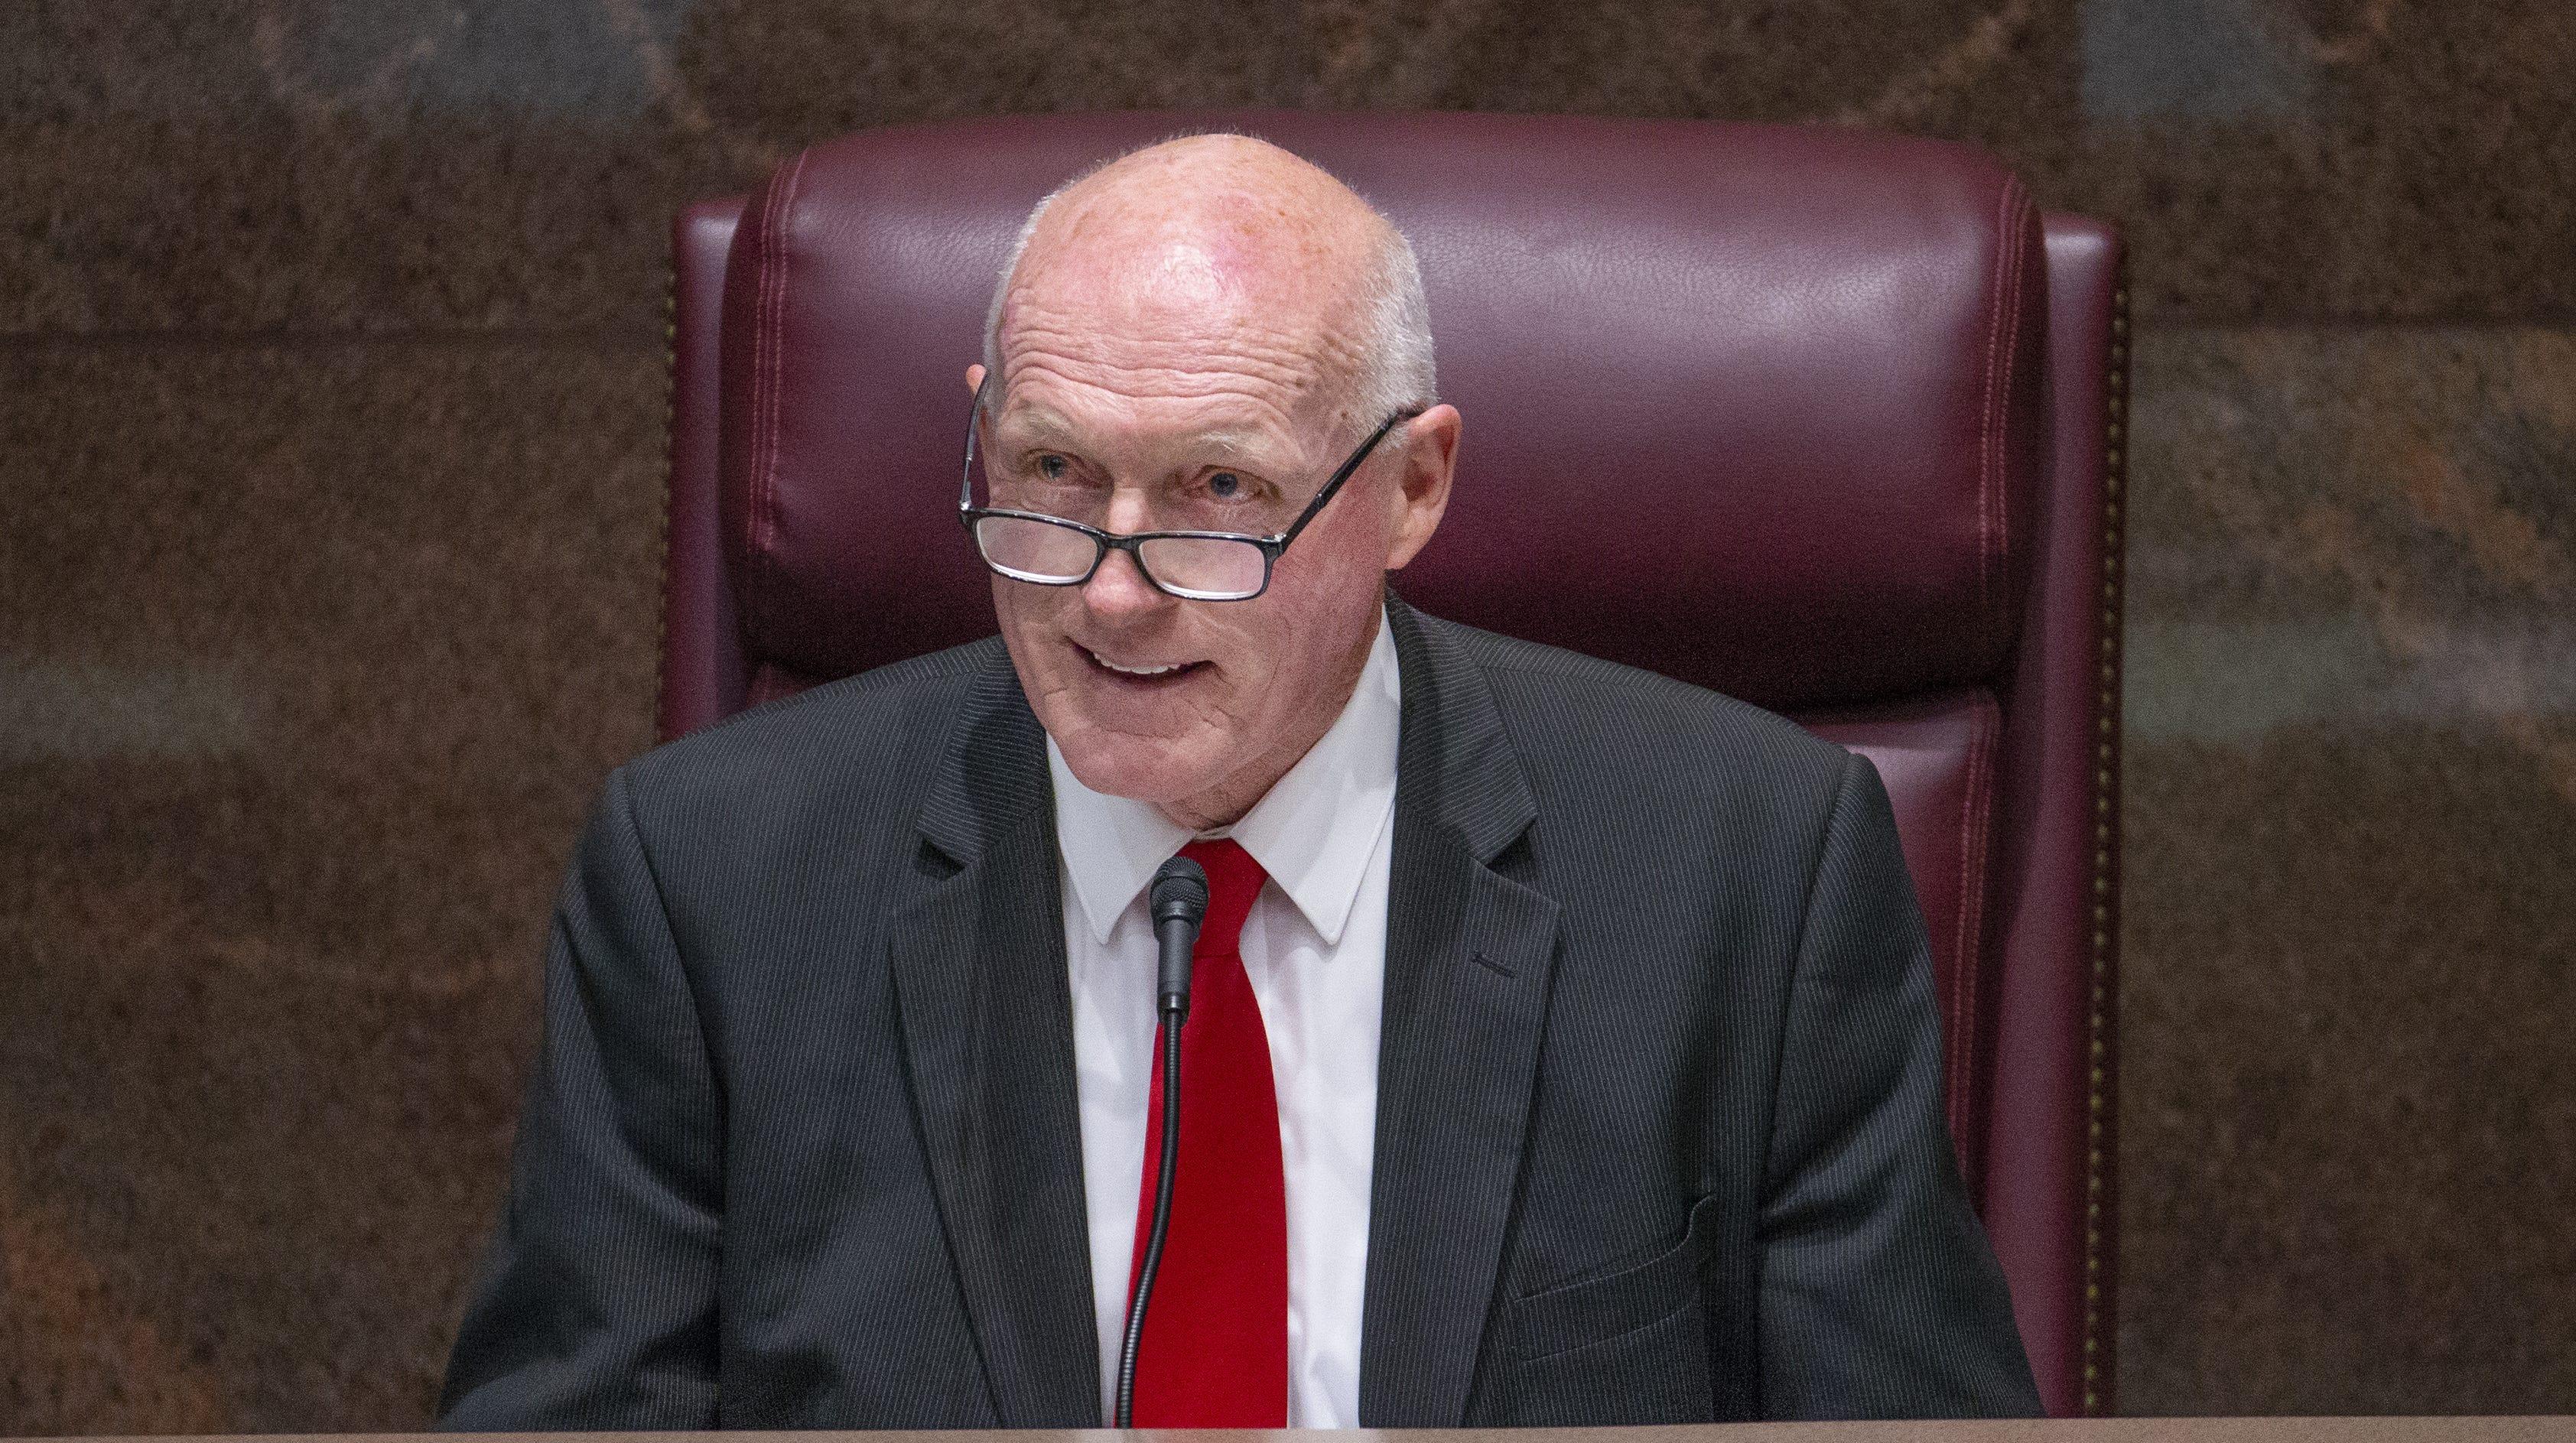 House speaker halts Arizona charter reform bill, saying it lacks 'accountability and transparency'